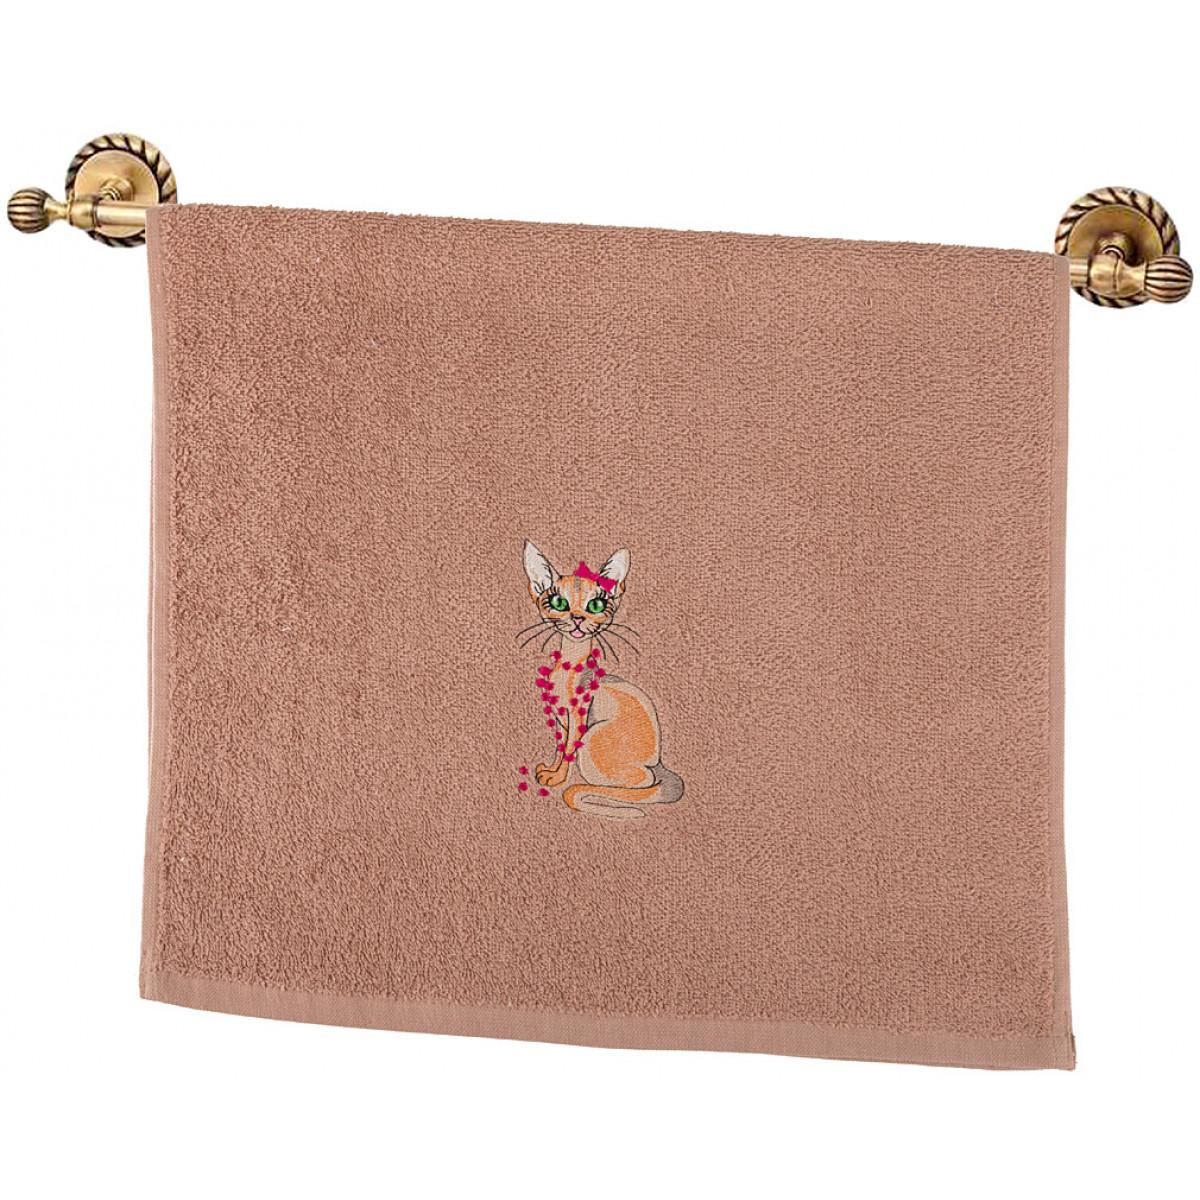 Полотенца Santalino Полотенце Sydney  (40х70 см) полотенца santalino полотенце shulamite 40х70 см